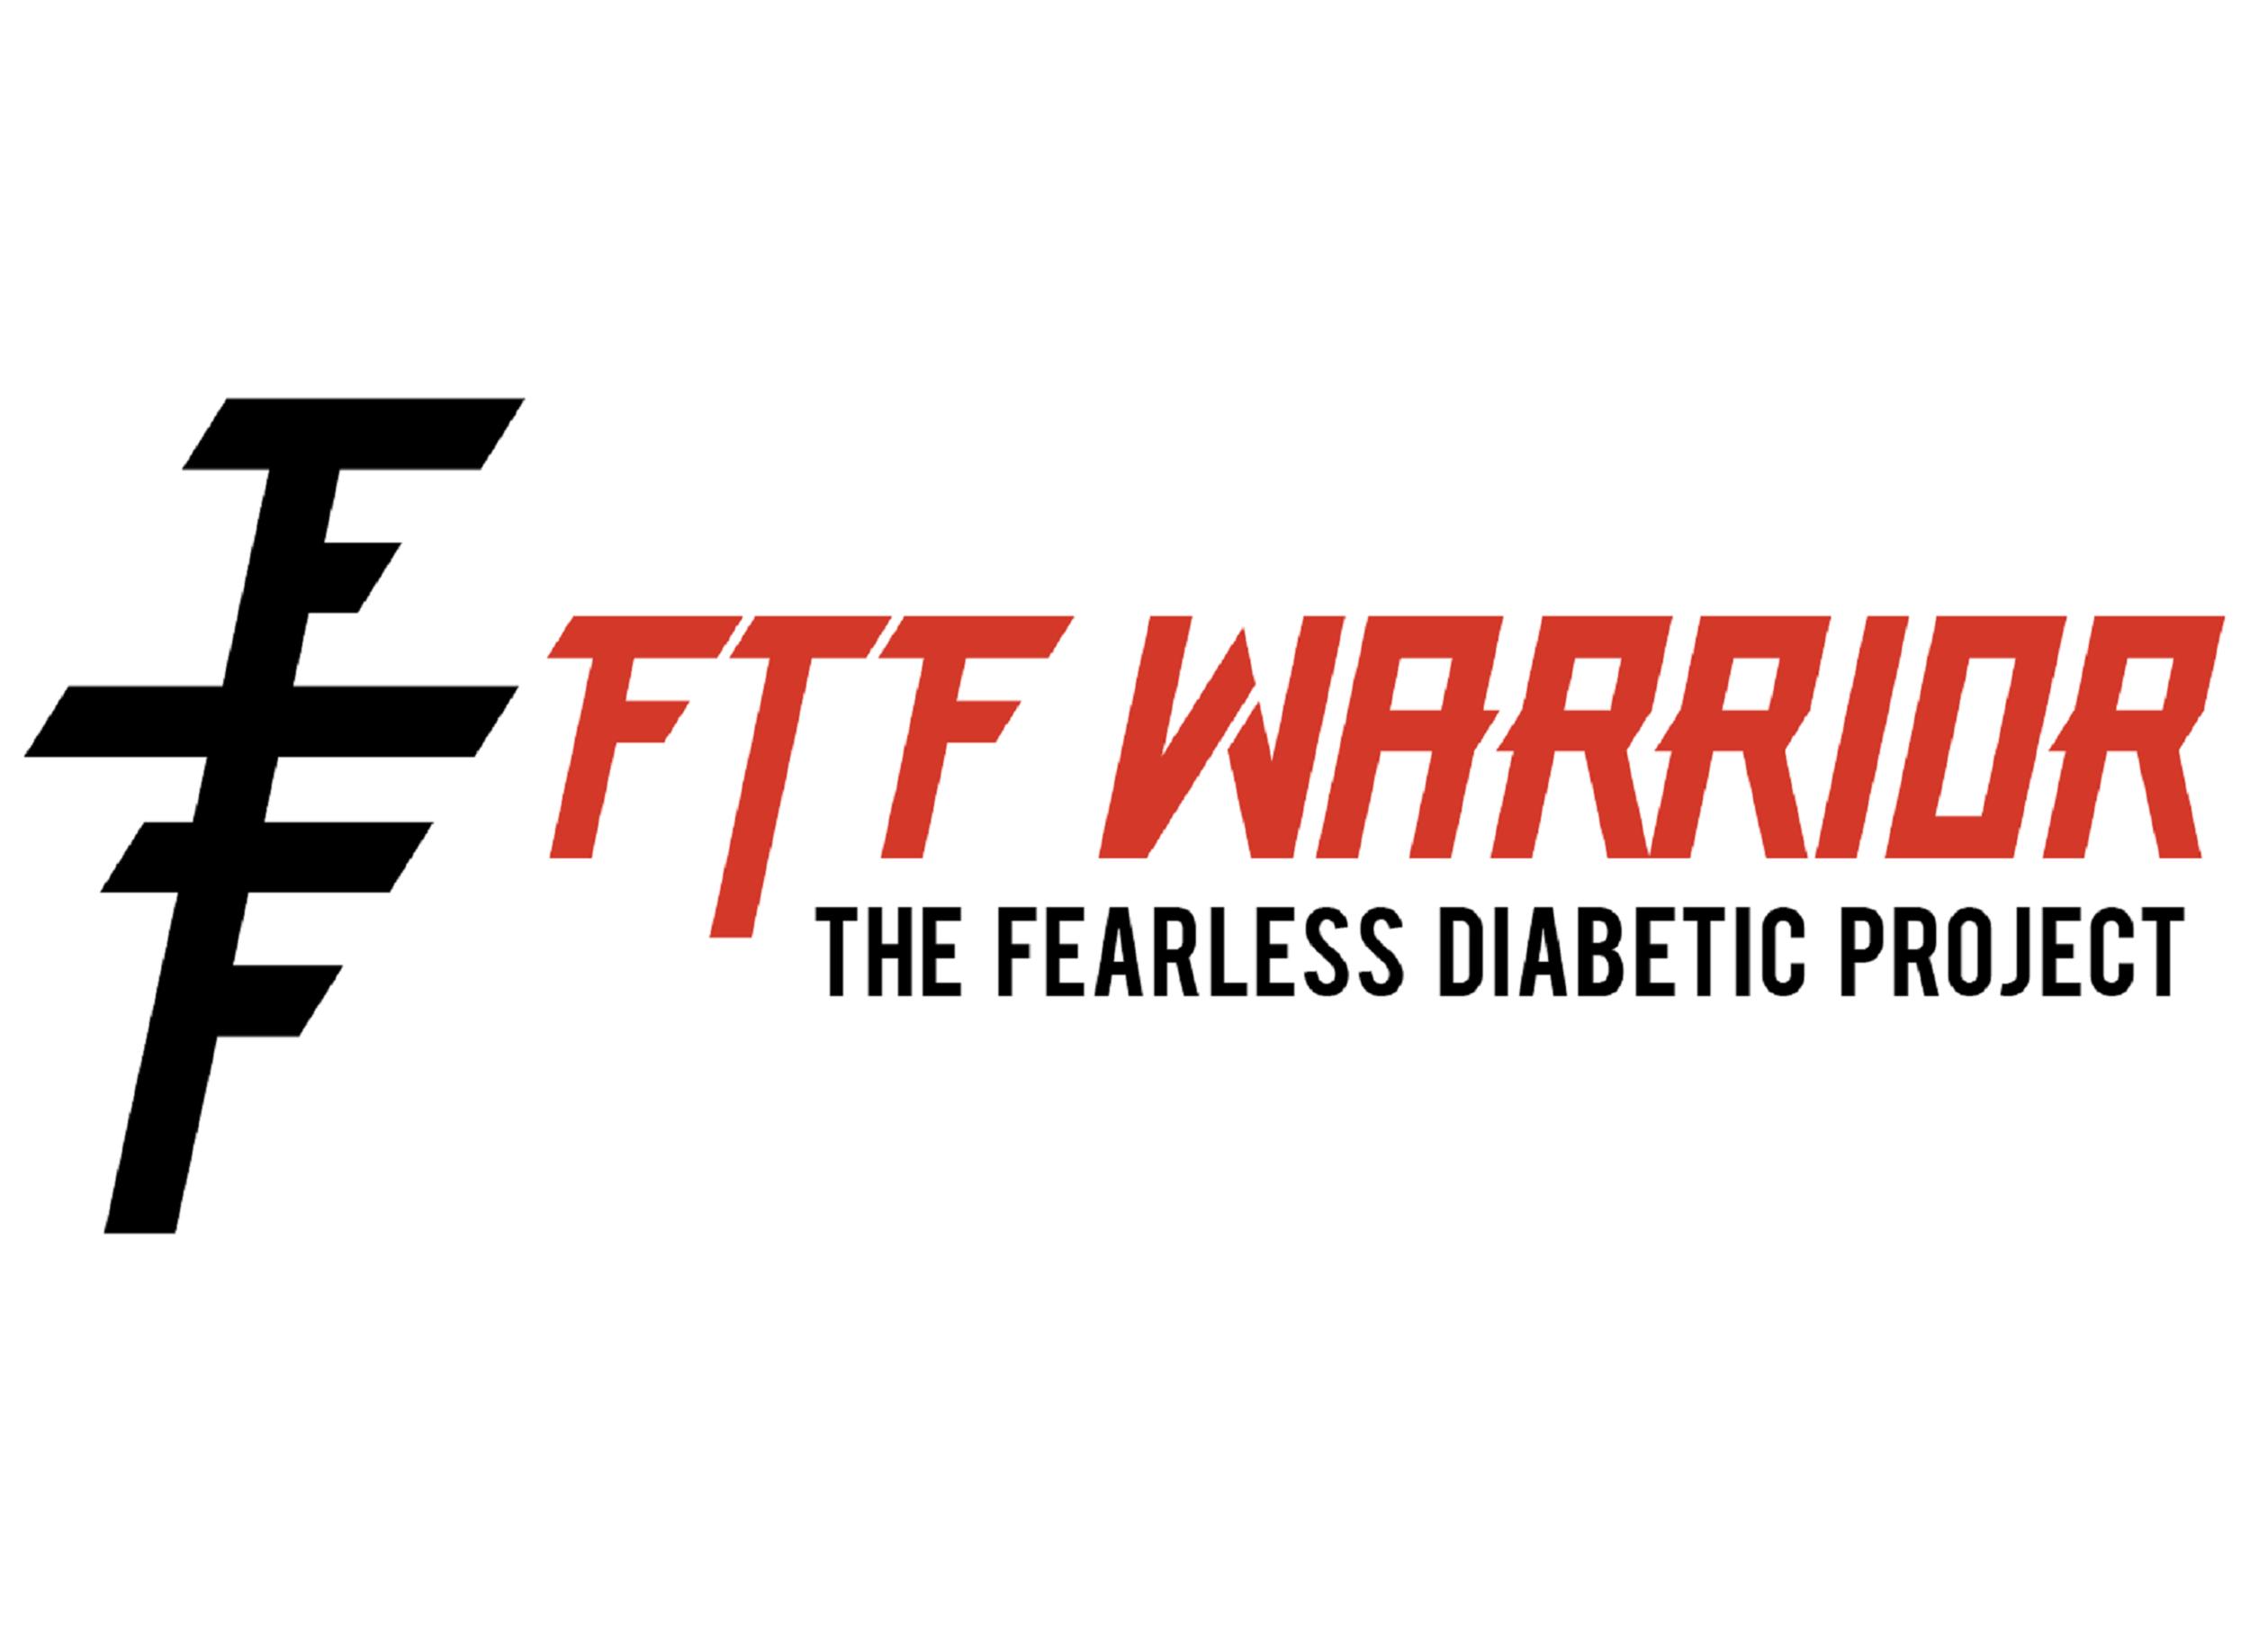 FTF Logo_Fearless Diabetic@3x - Copy.png